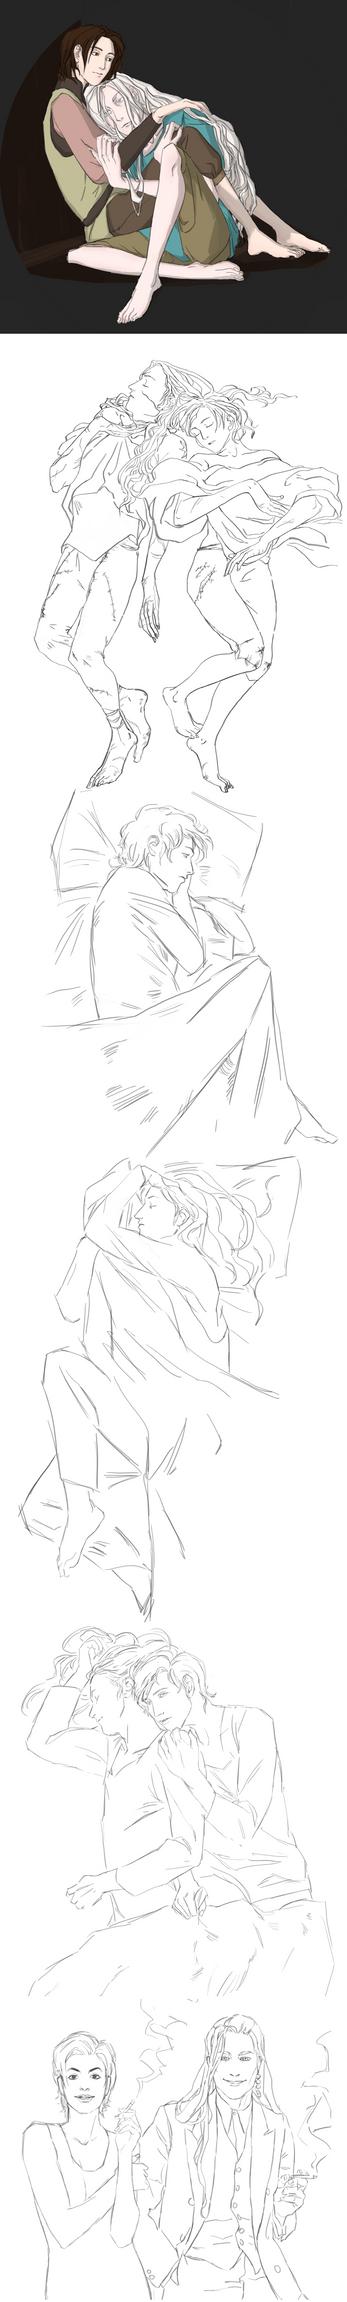 Sketch Dump by anvemi